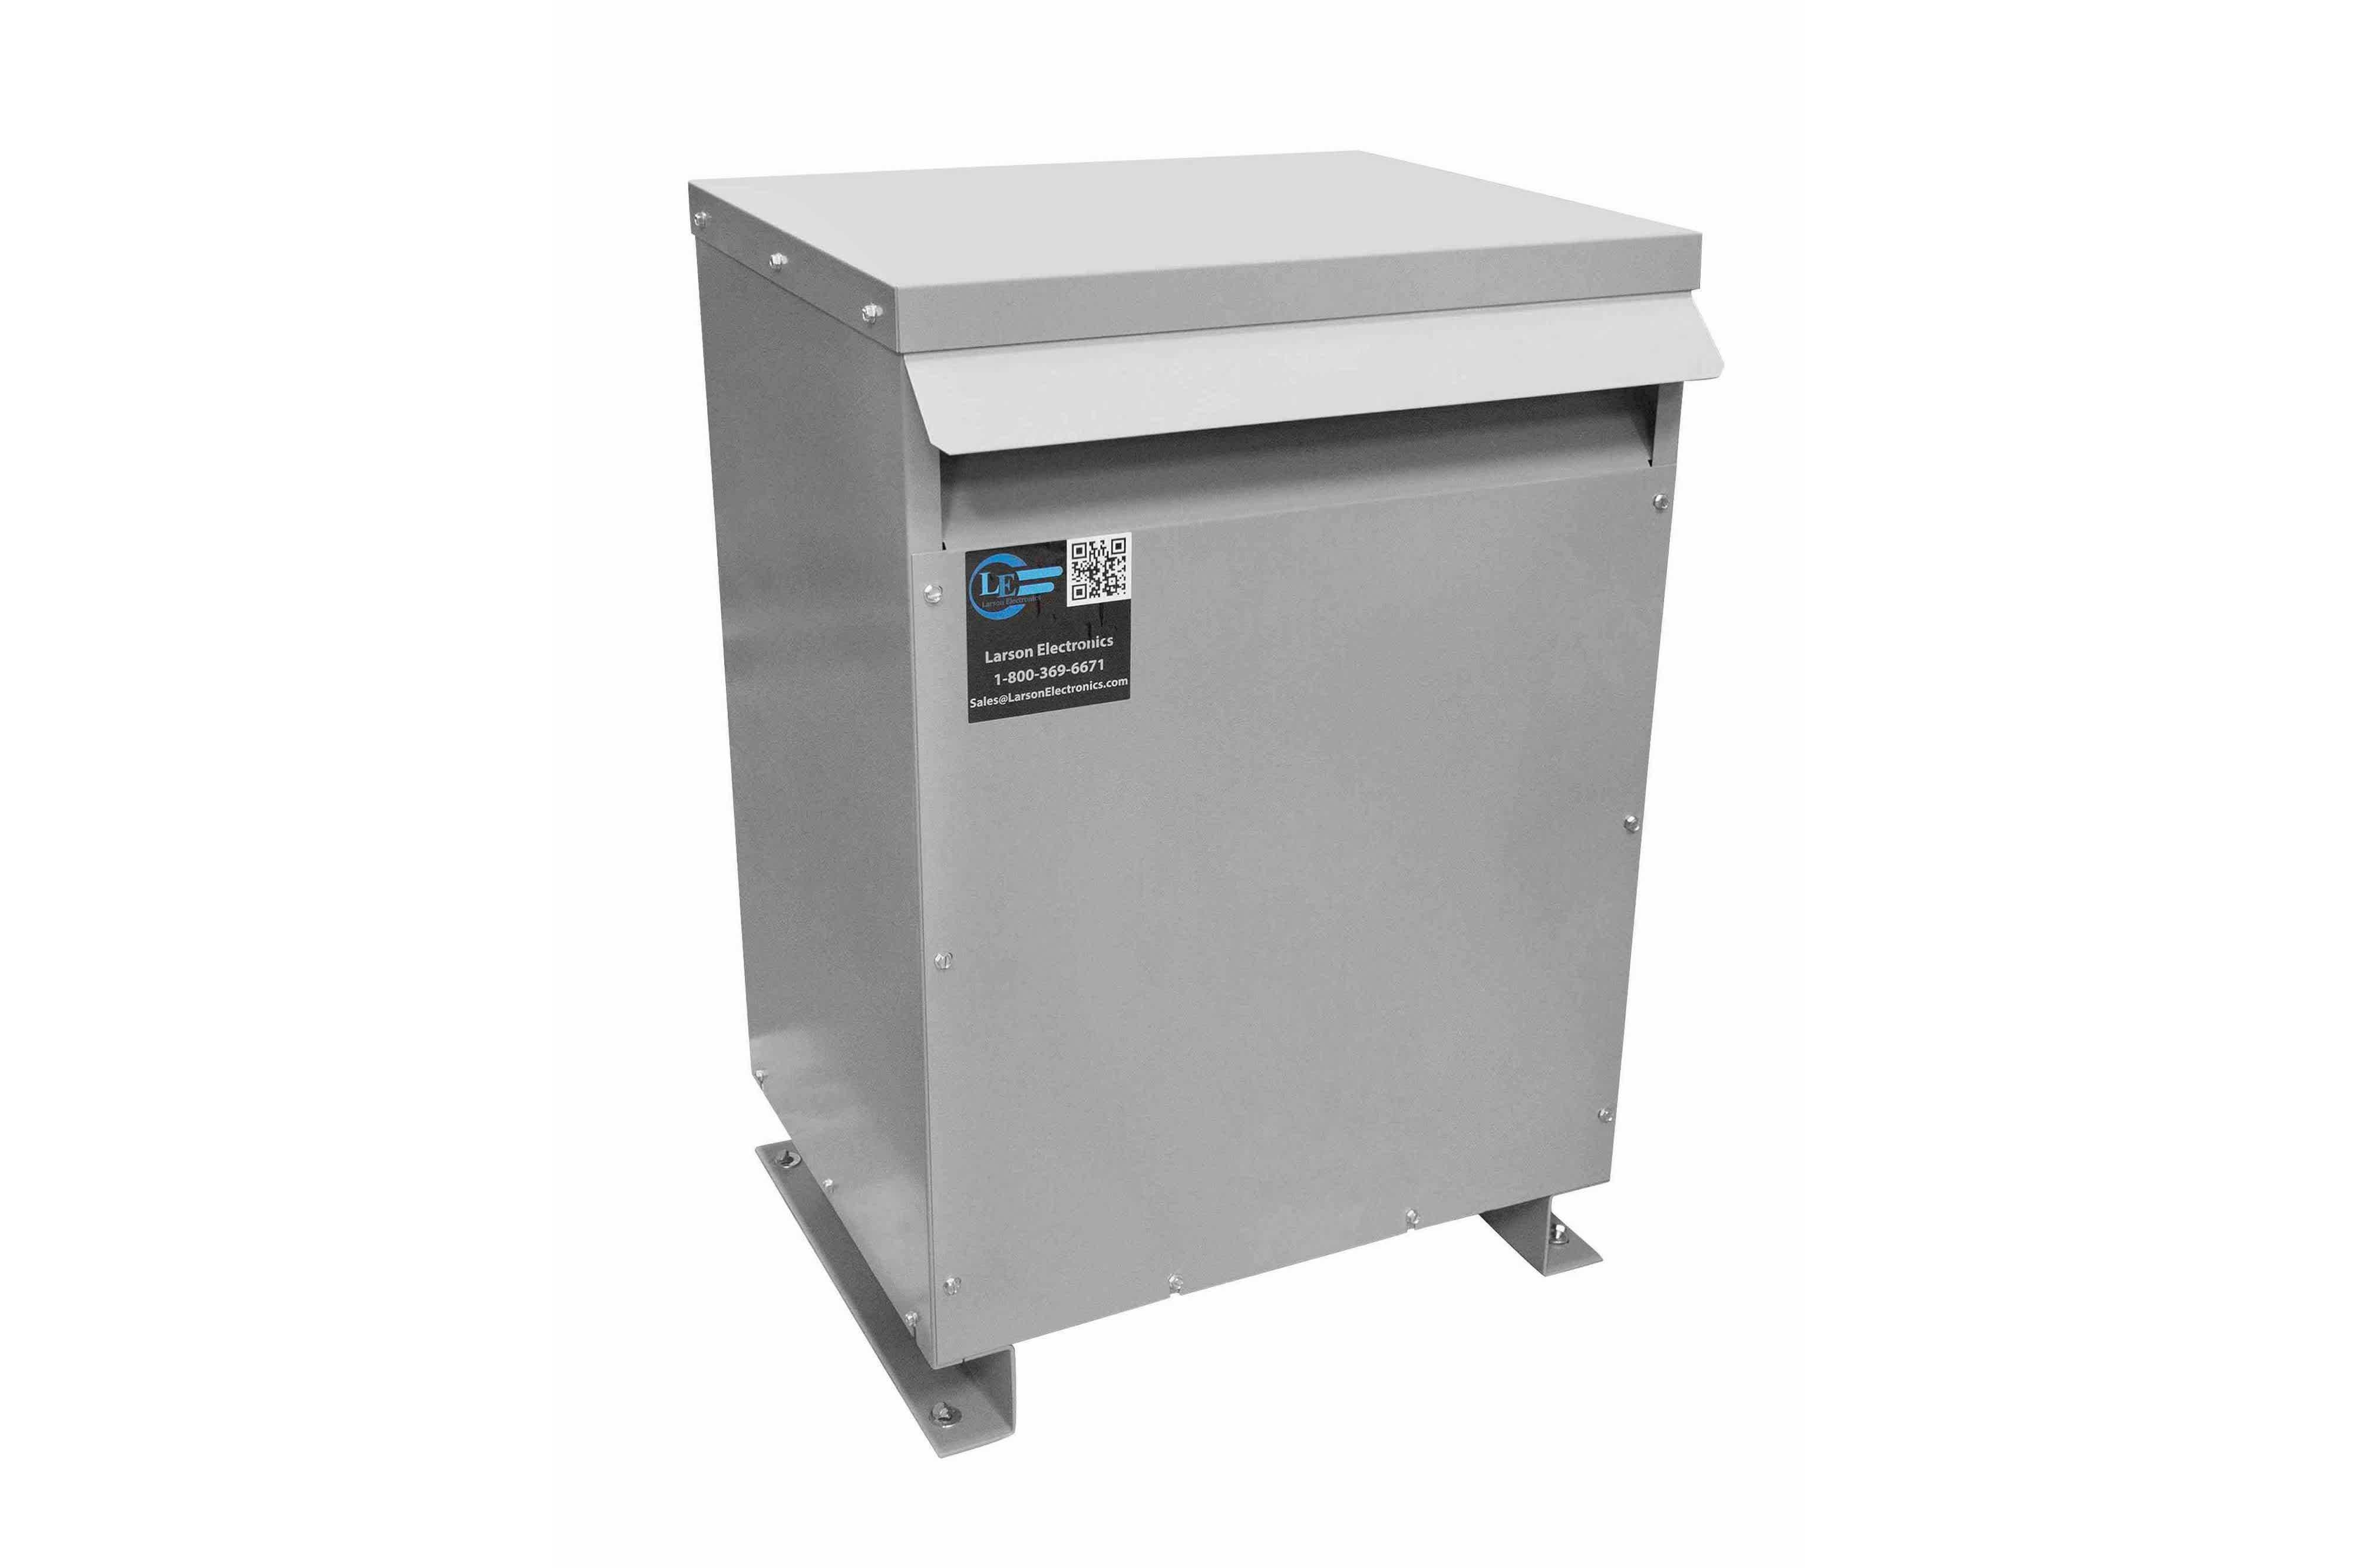 12 kVA 3PH Isolation Transformer, 575V Wye Primary, 480V Delta Secondary, N3R, Ventilated, 60 Hz